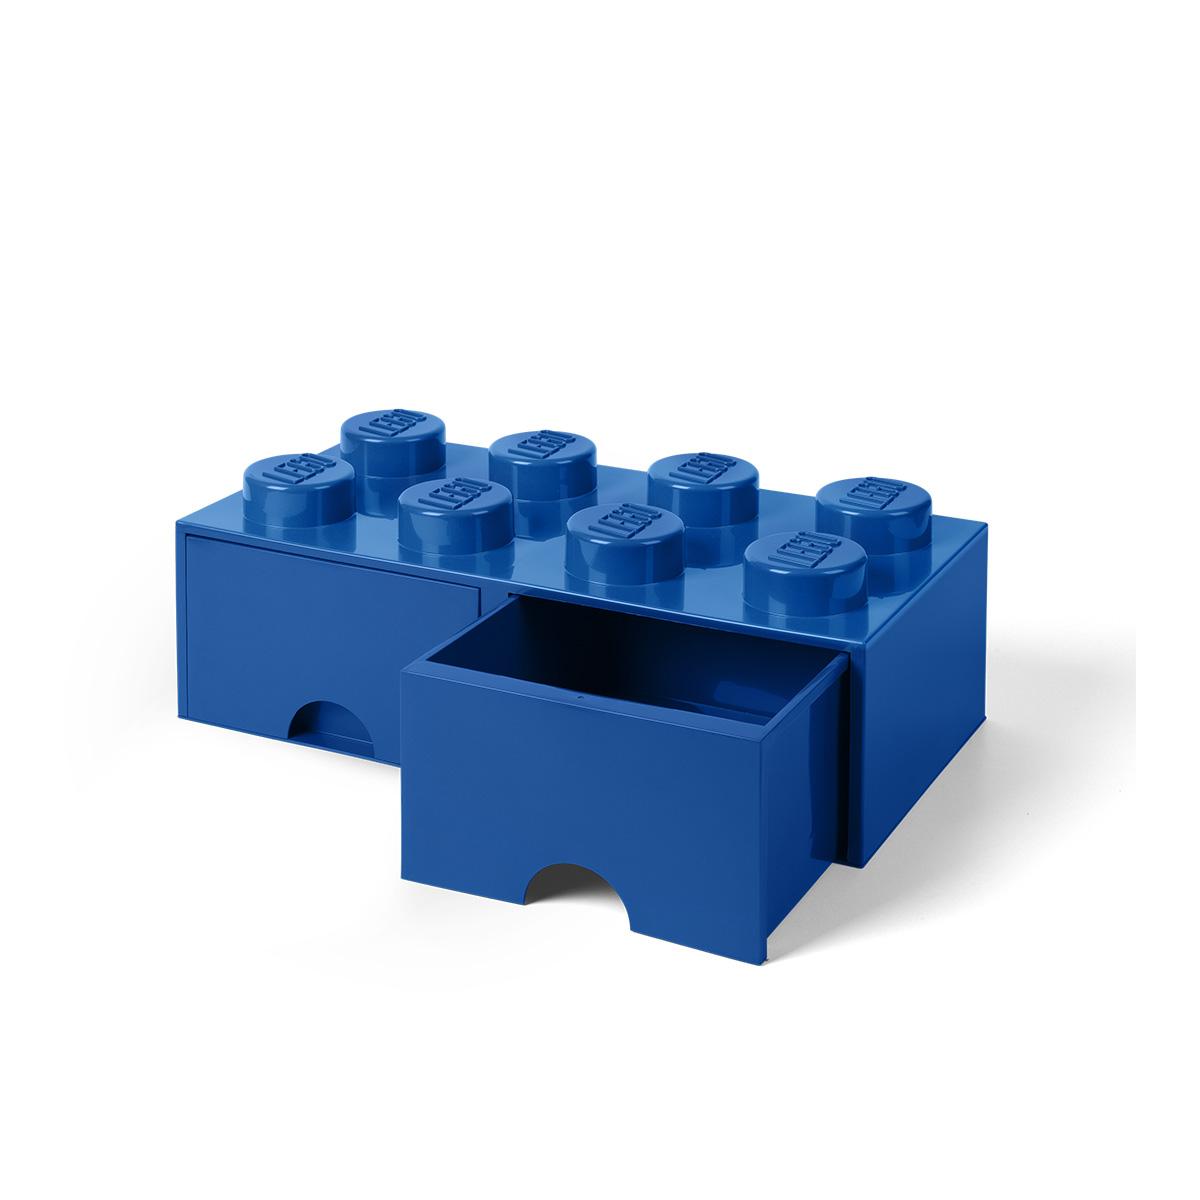 LEGO opbevaringskasse med 2 skuffer - Blå